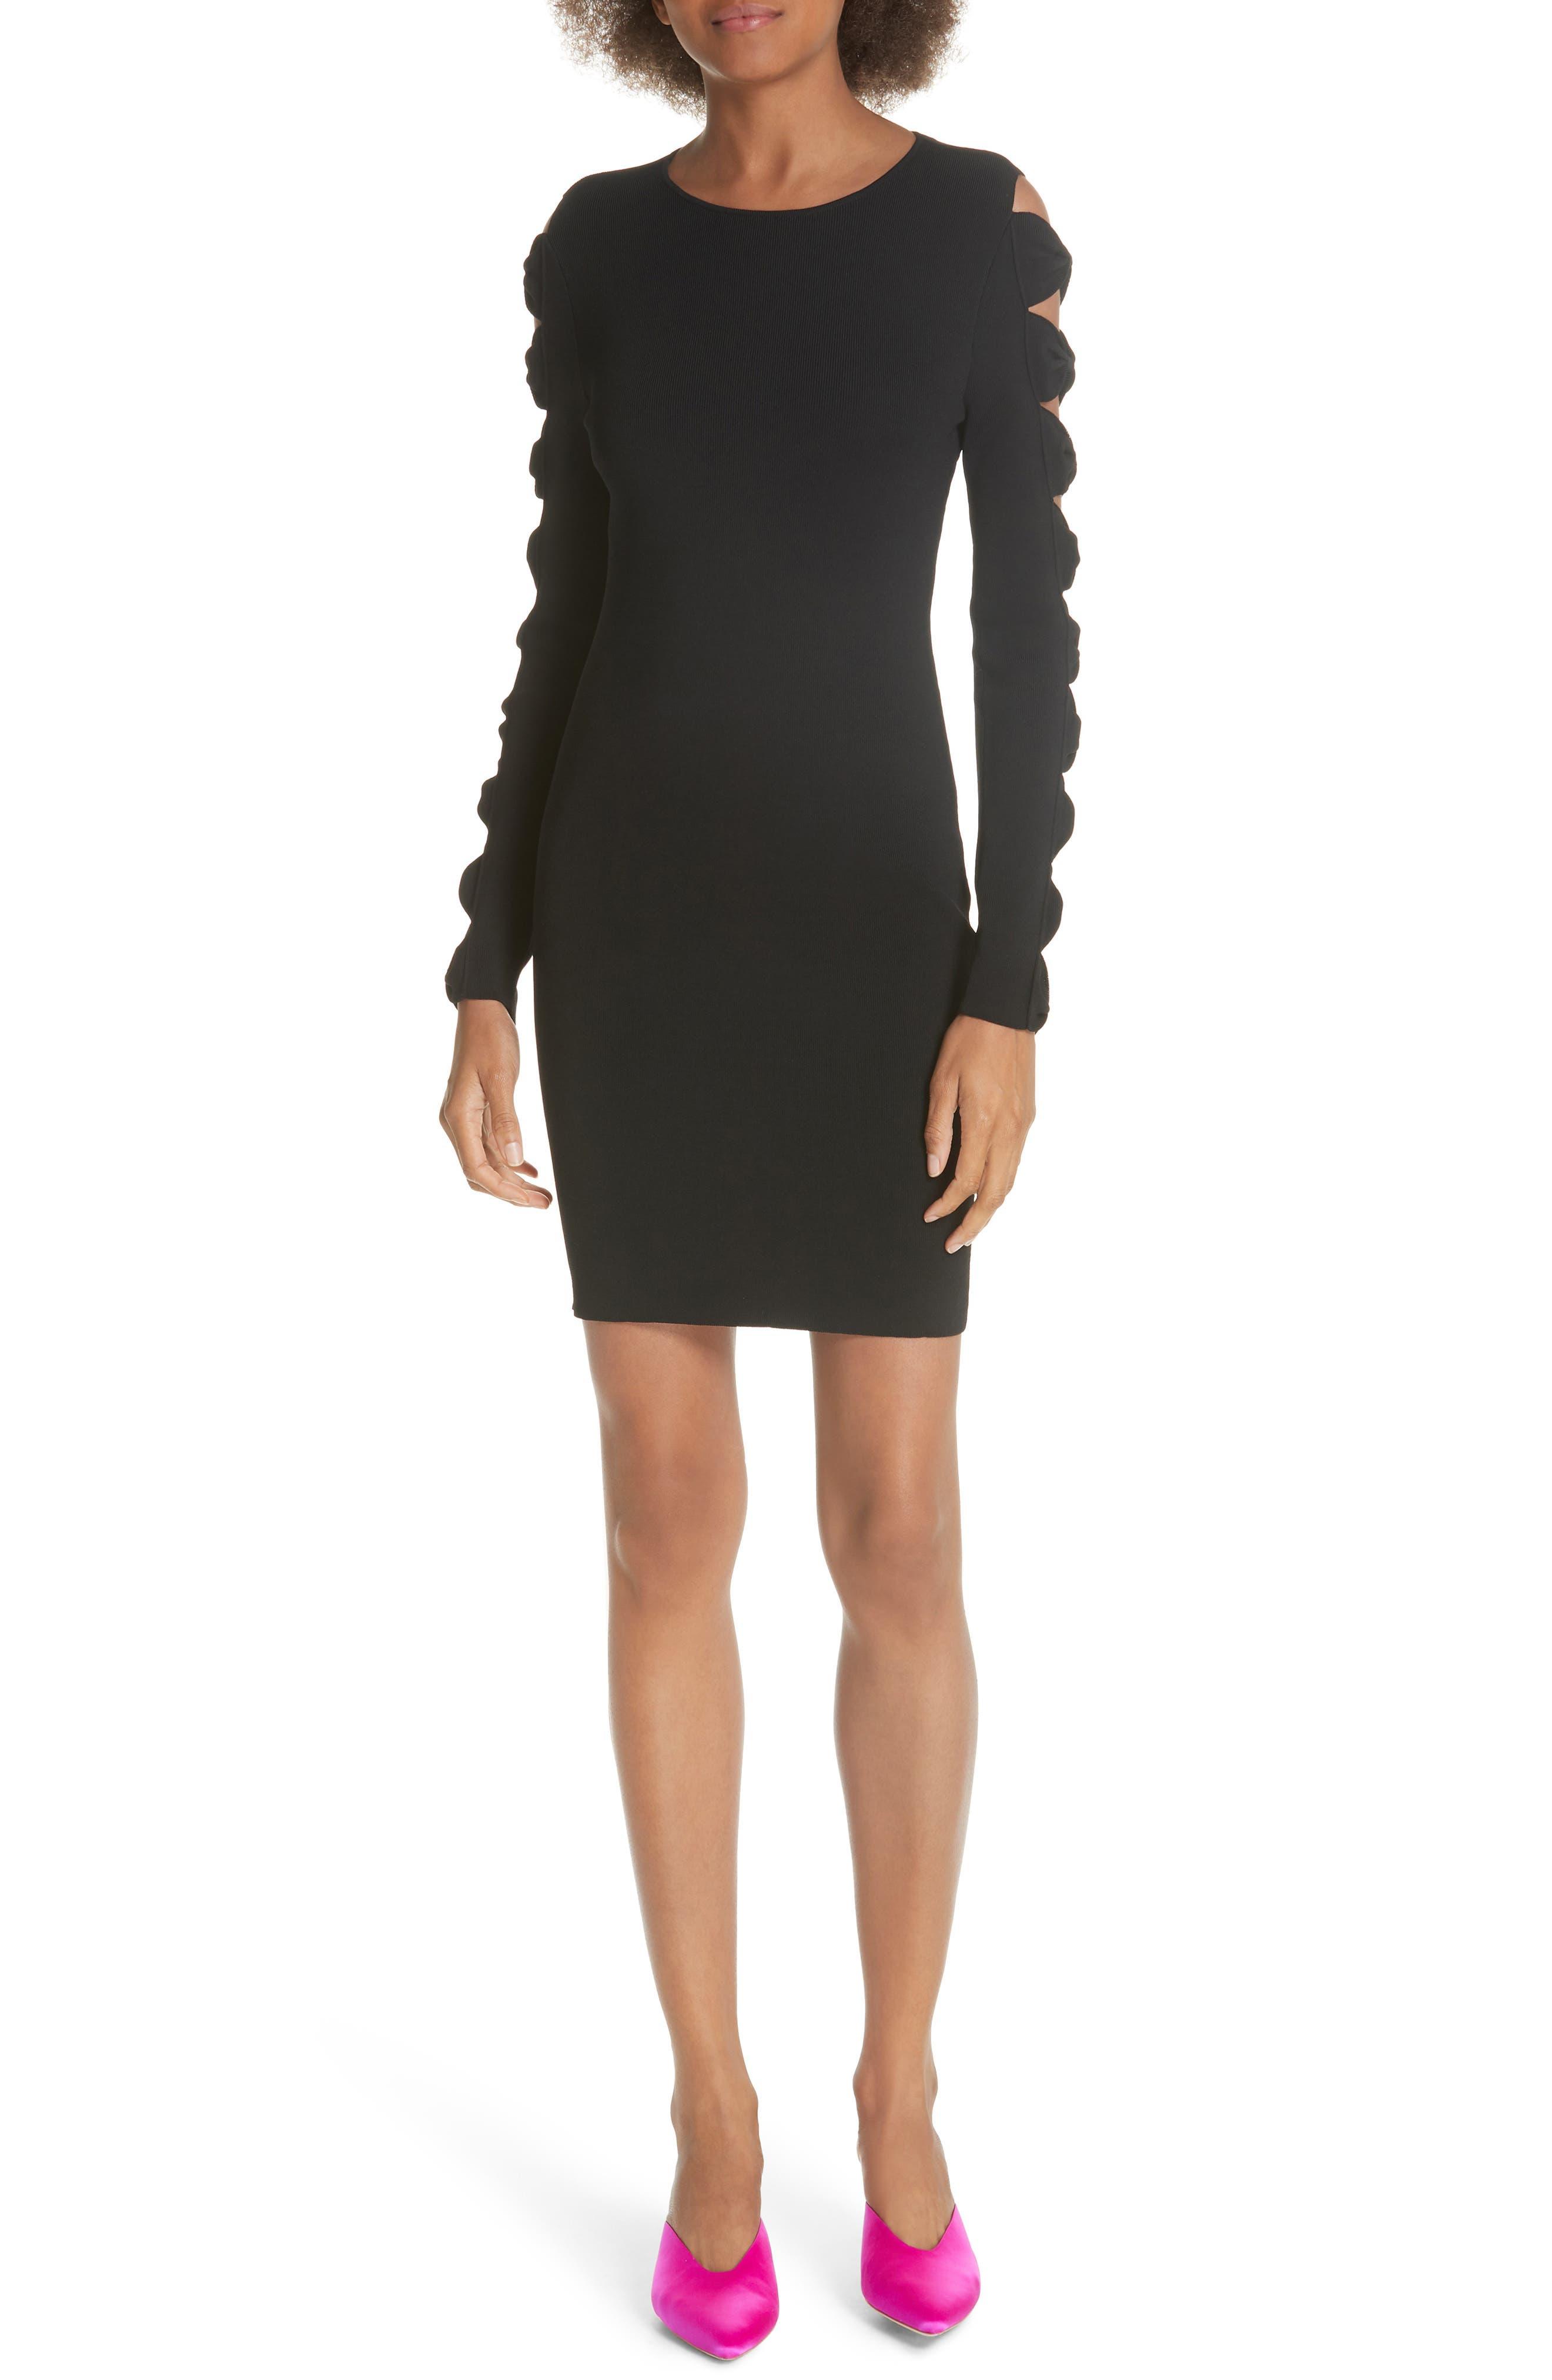 Ted Baker London Jayney Bow Sleeve Knit Dress, Black